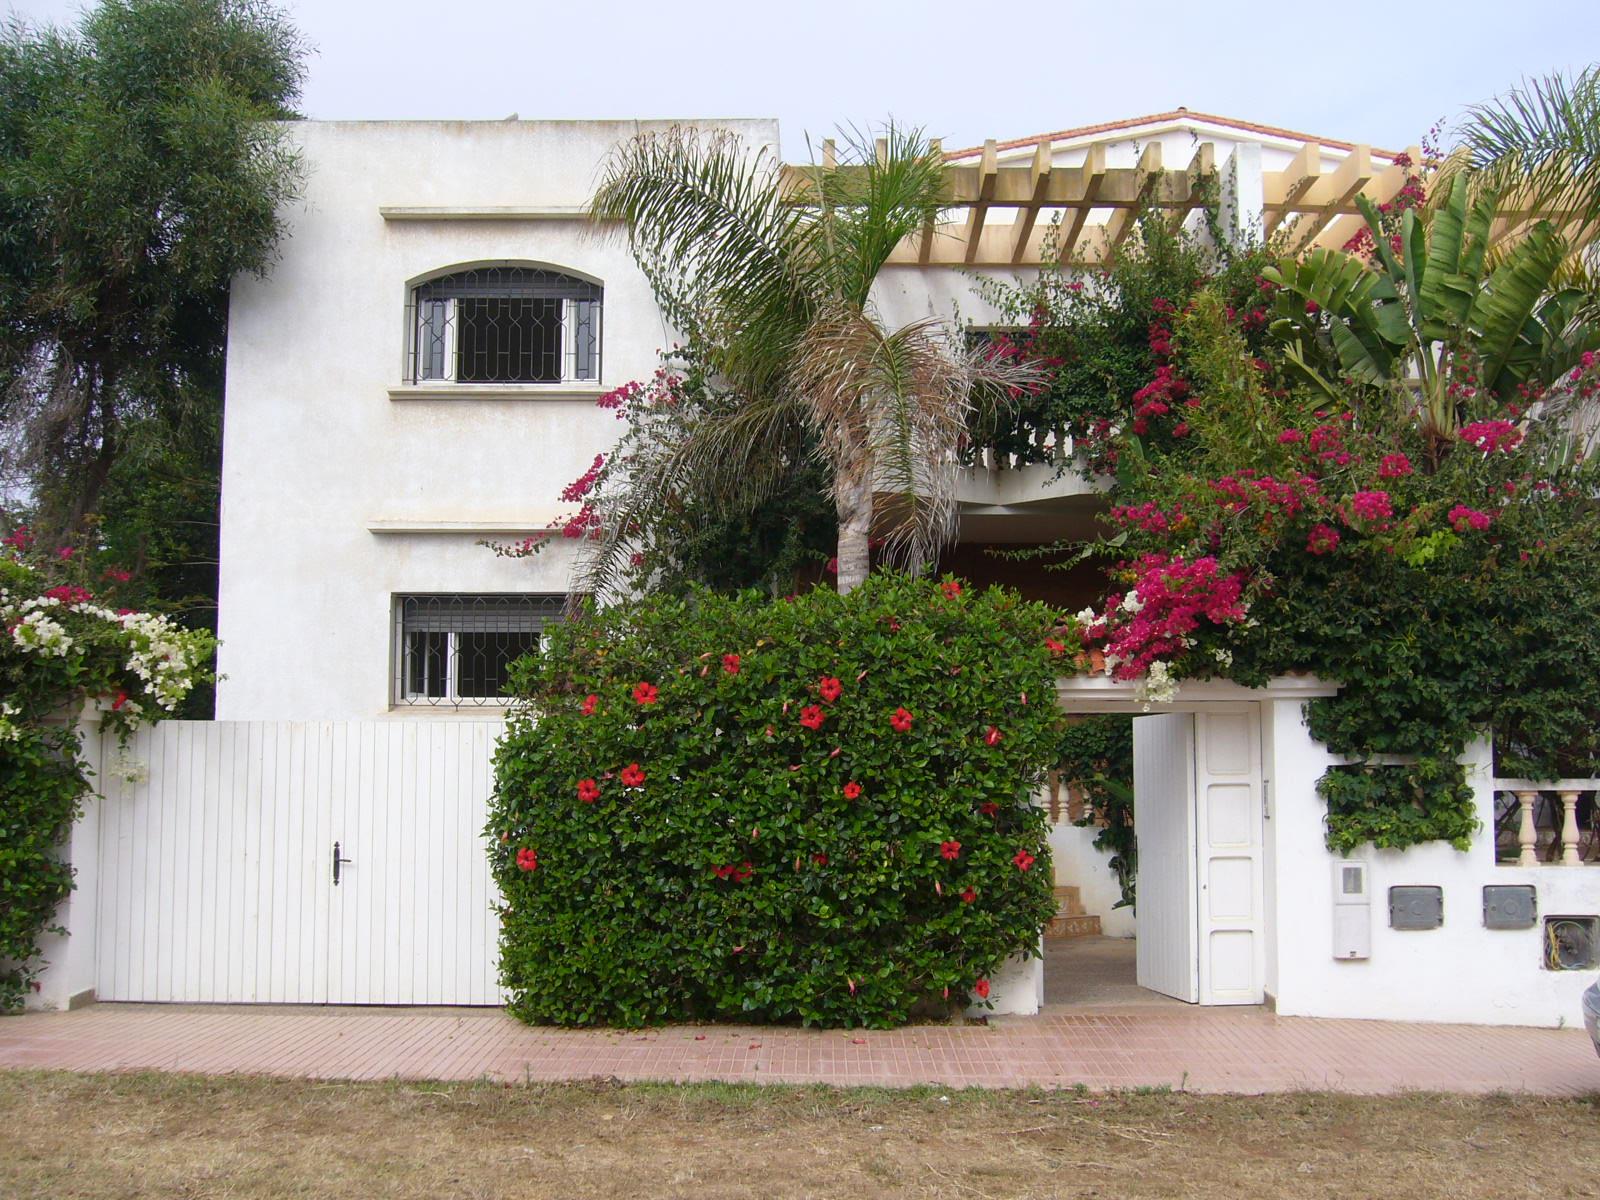 Location villa à casablanca maroc sidi rahal villa à louer à ...